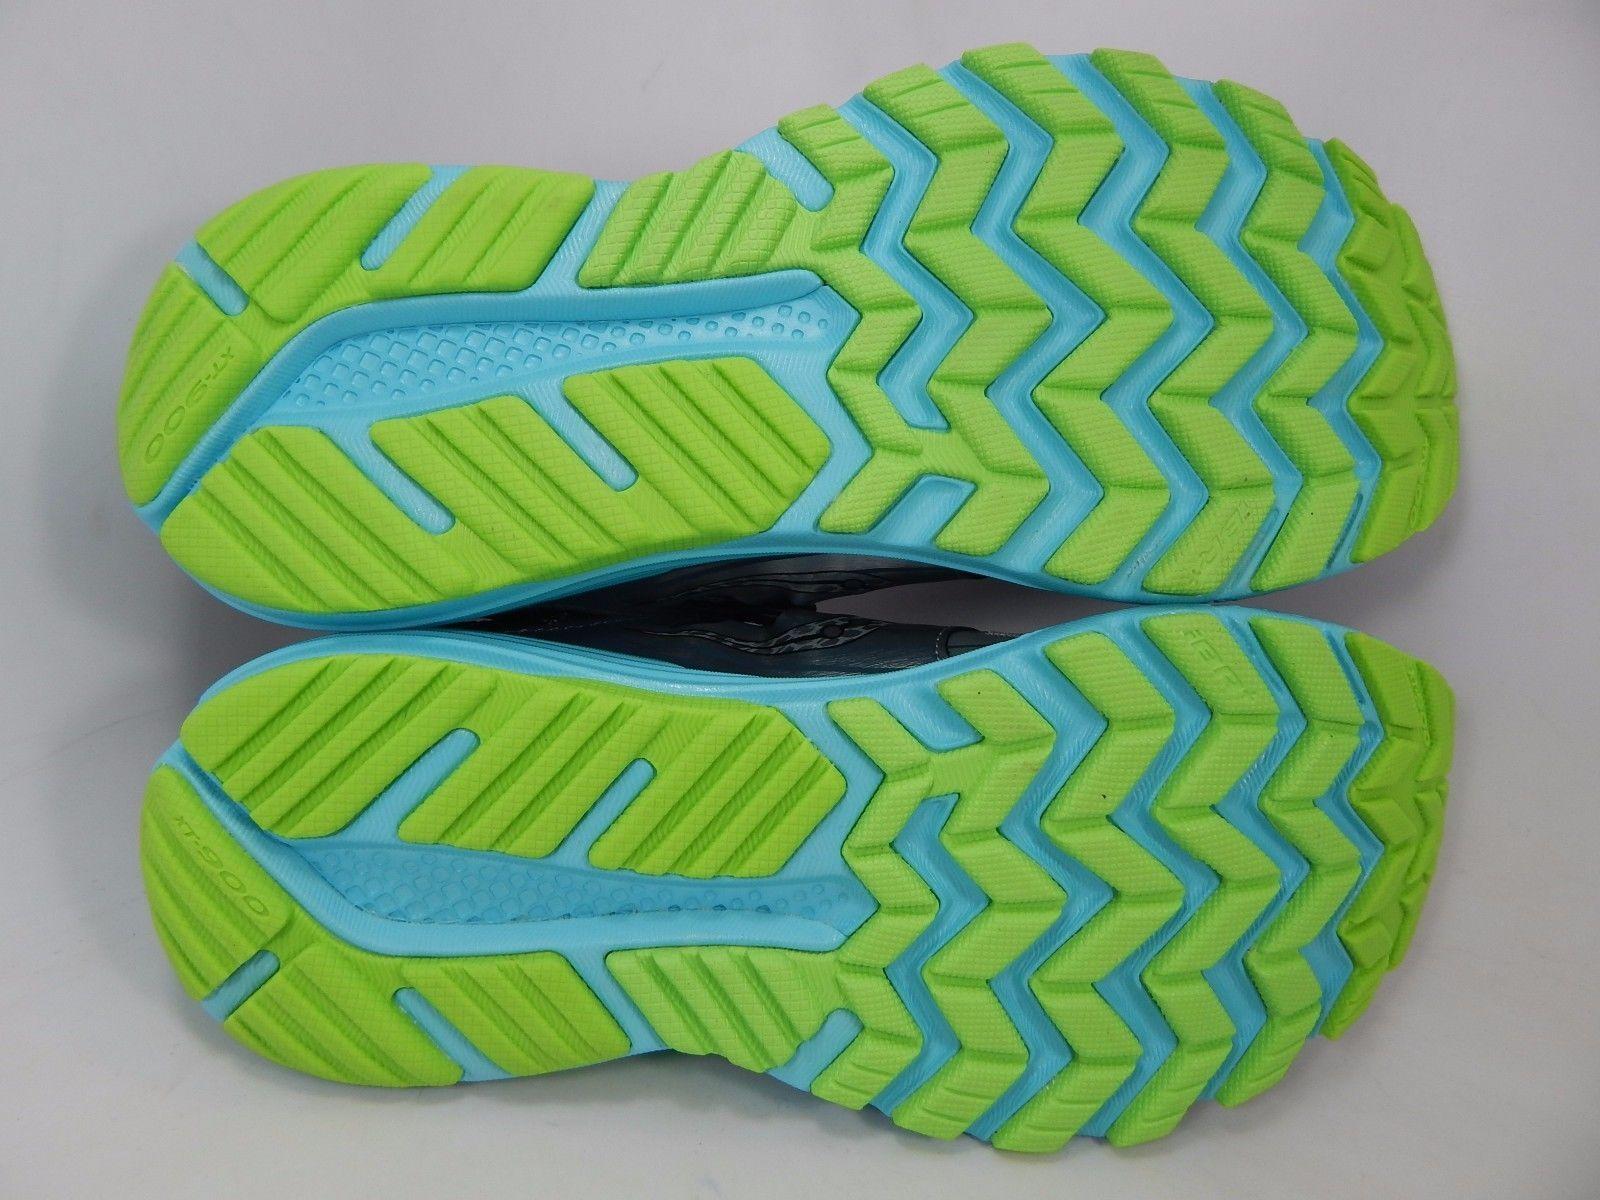 MISMATCH Saucony Triumph ISO 2 Women's Running Shoes Sz US 9.5 Left & 10.5 Right